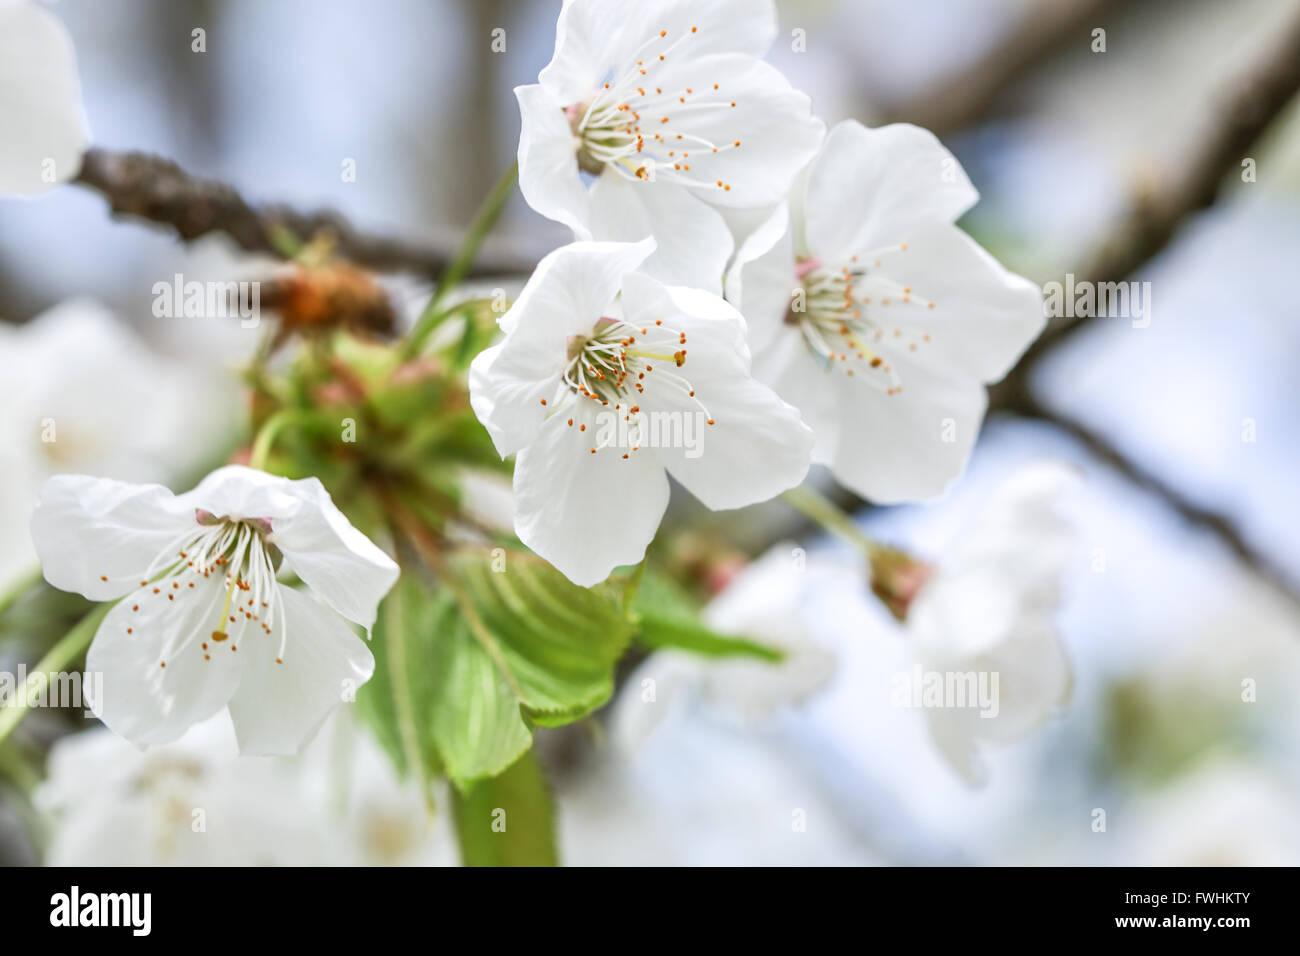 White cherry flower - Stock Image